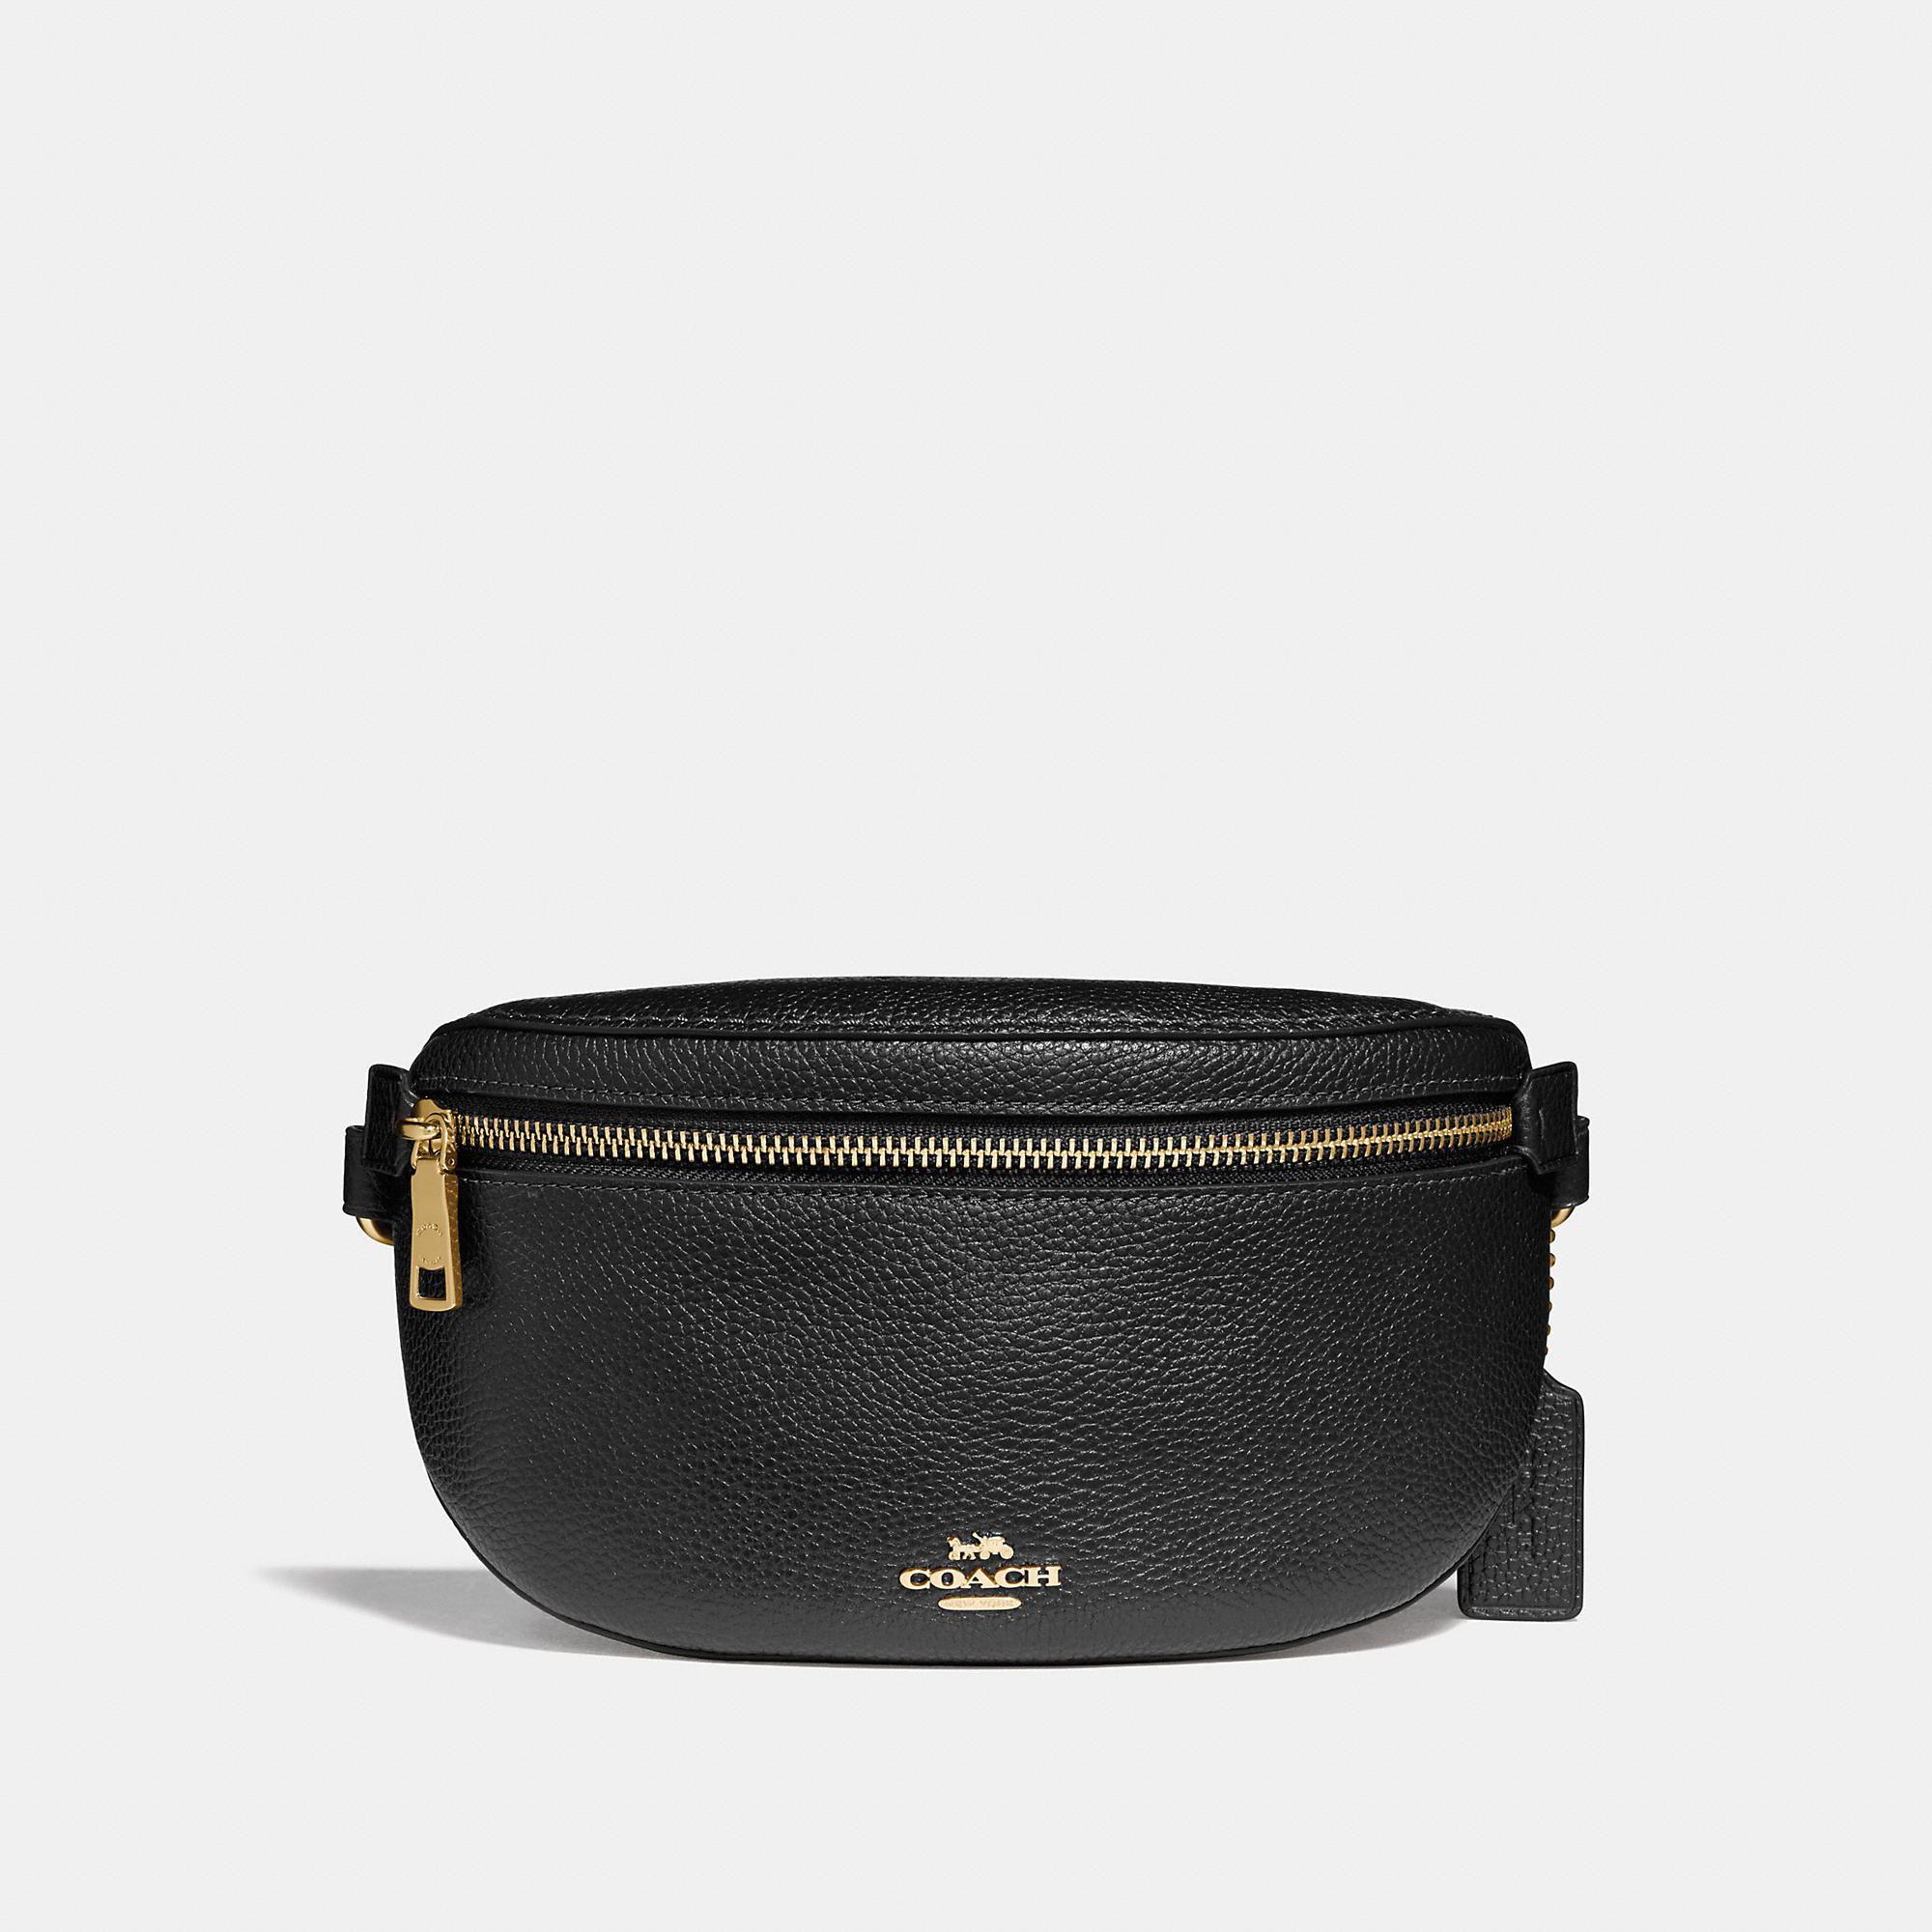 269ce1eeb2 Belt Bag in 2019 | Products | Leather belt bag, Coach belt, Bags